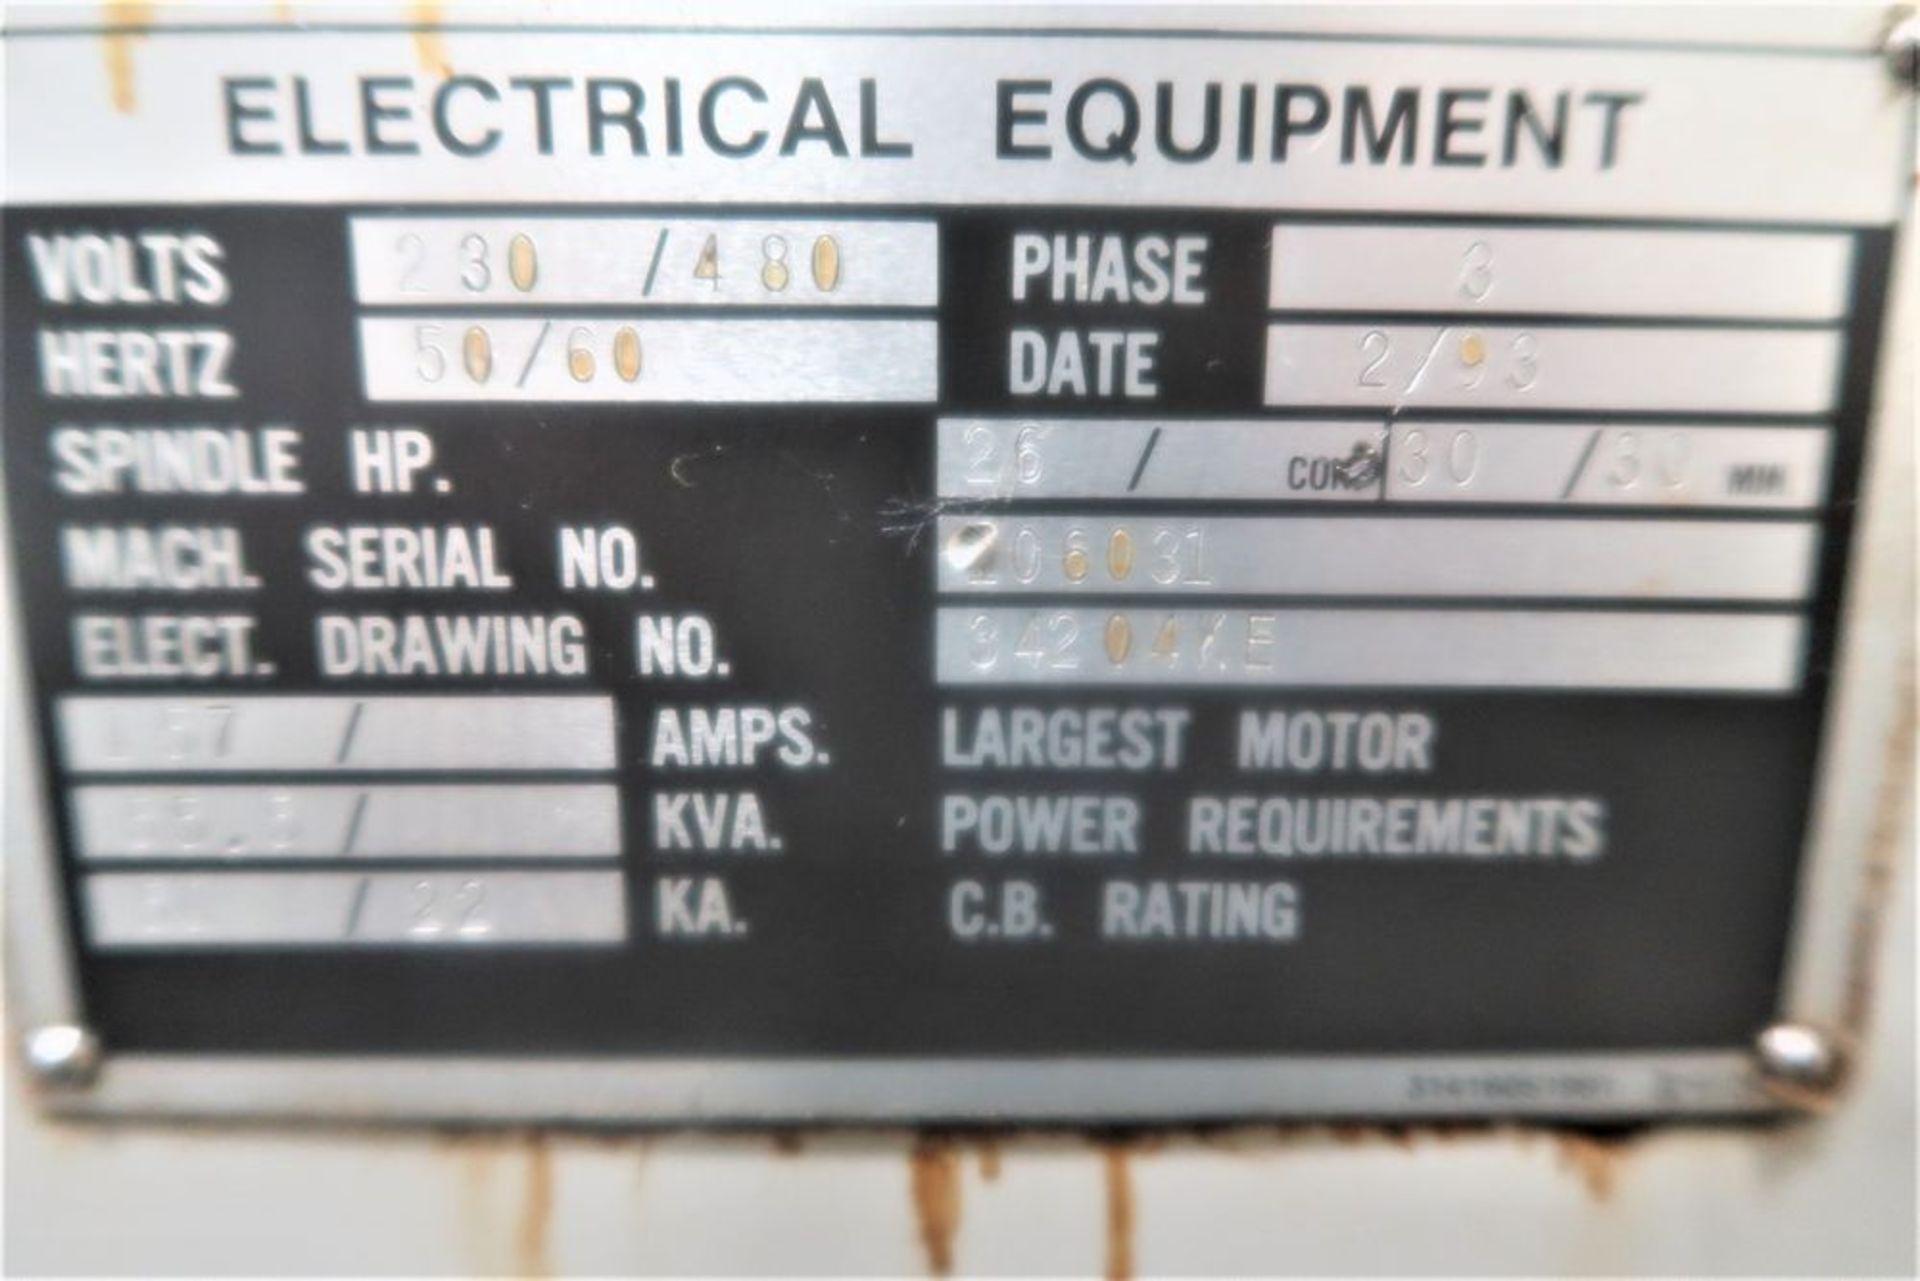 Lot 38 - Mazak Quick Turn 28 2-Axis CNC Turning Center Lathe, S/N 106031